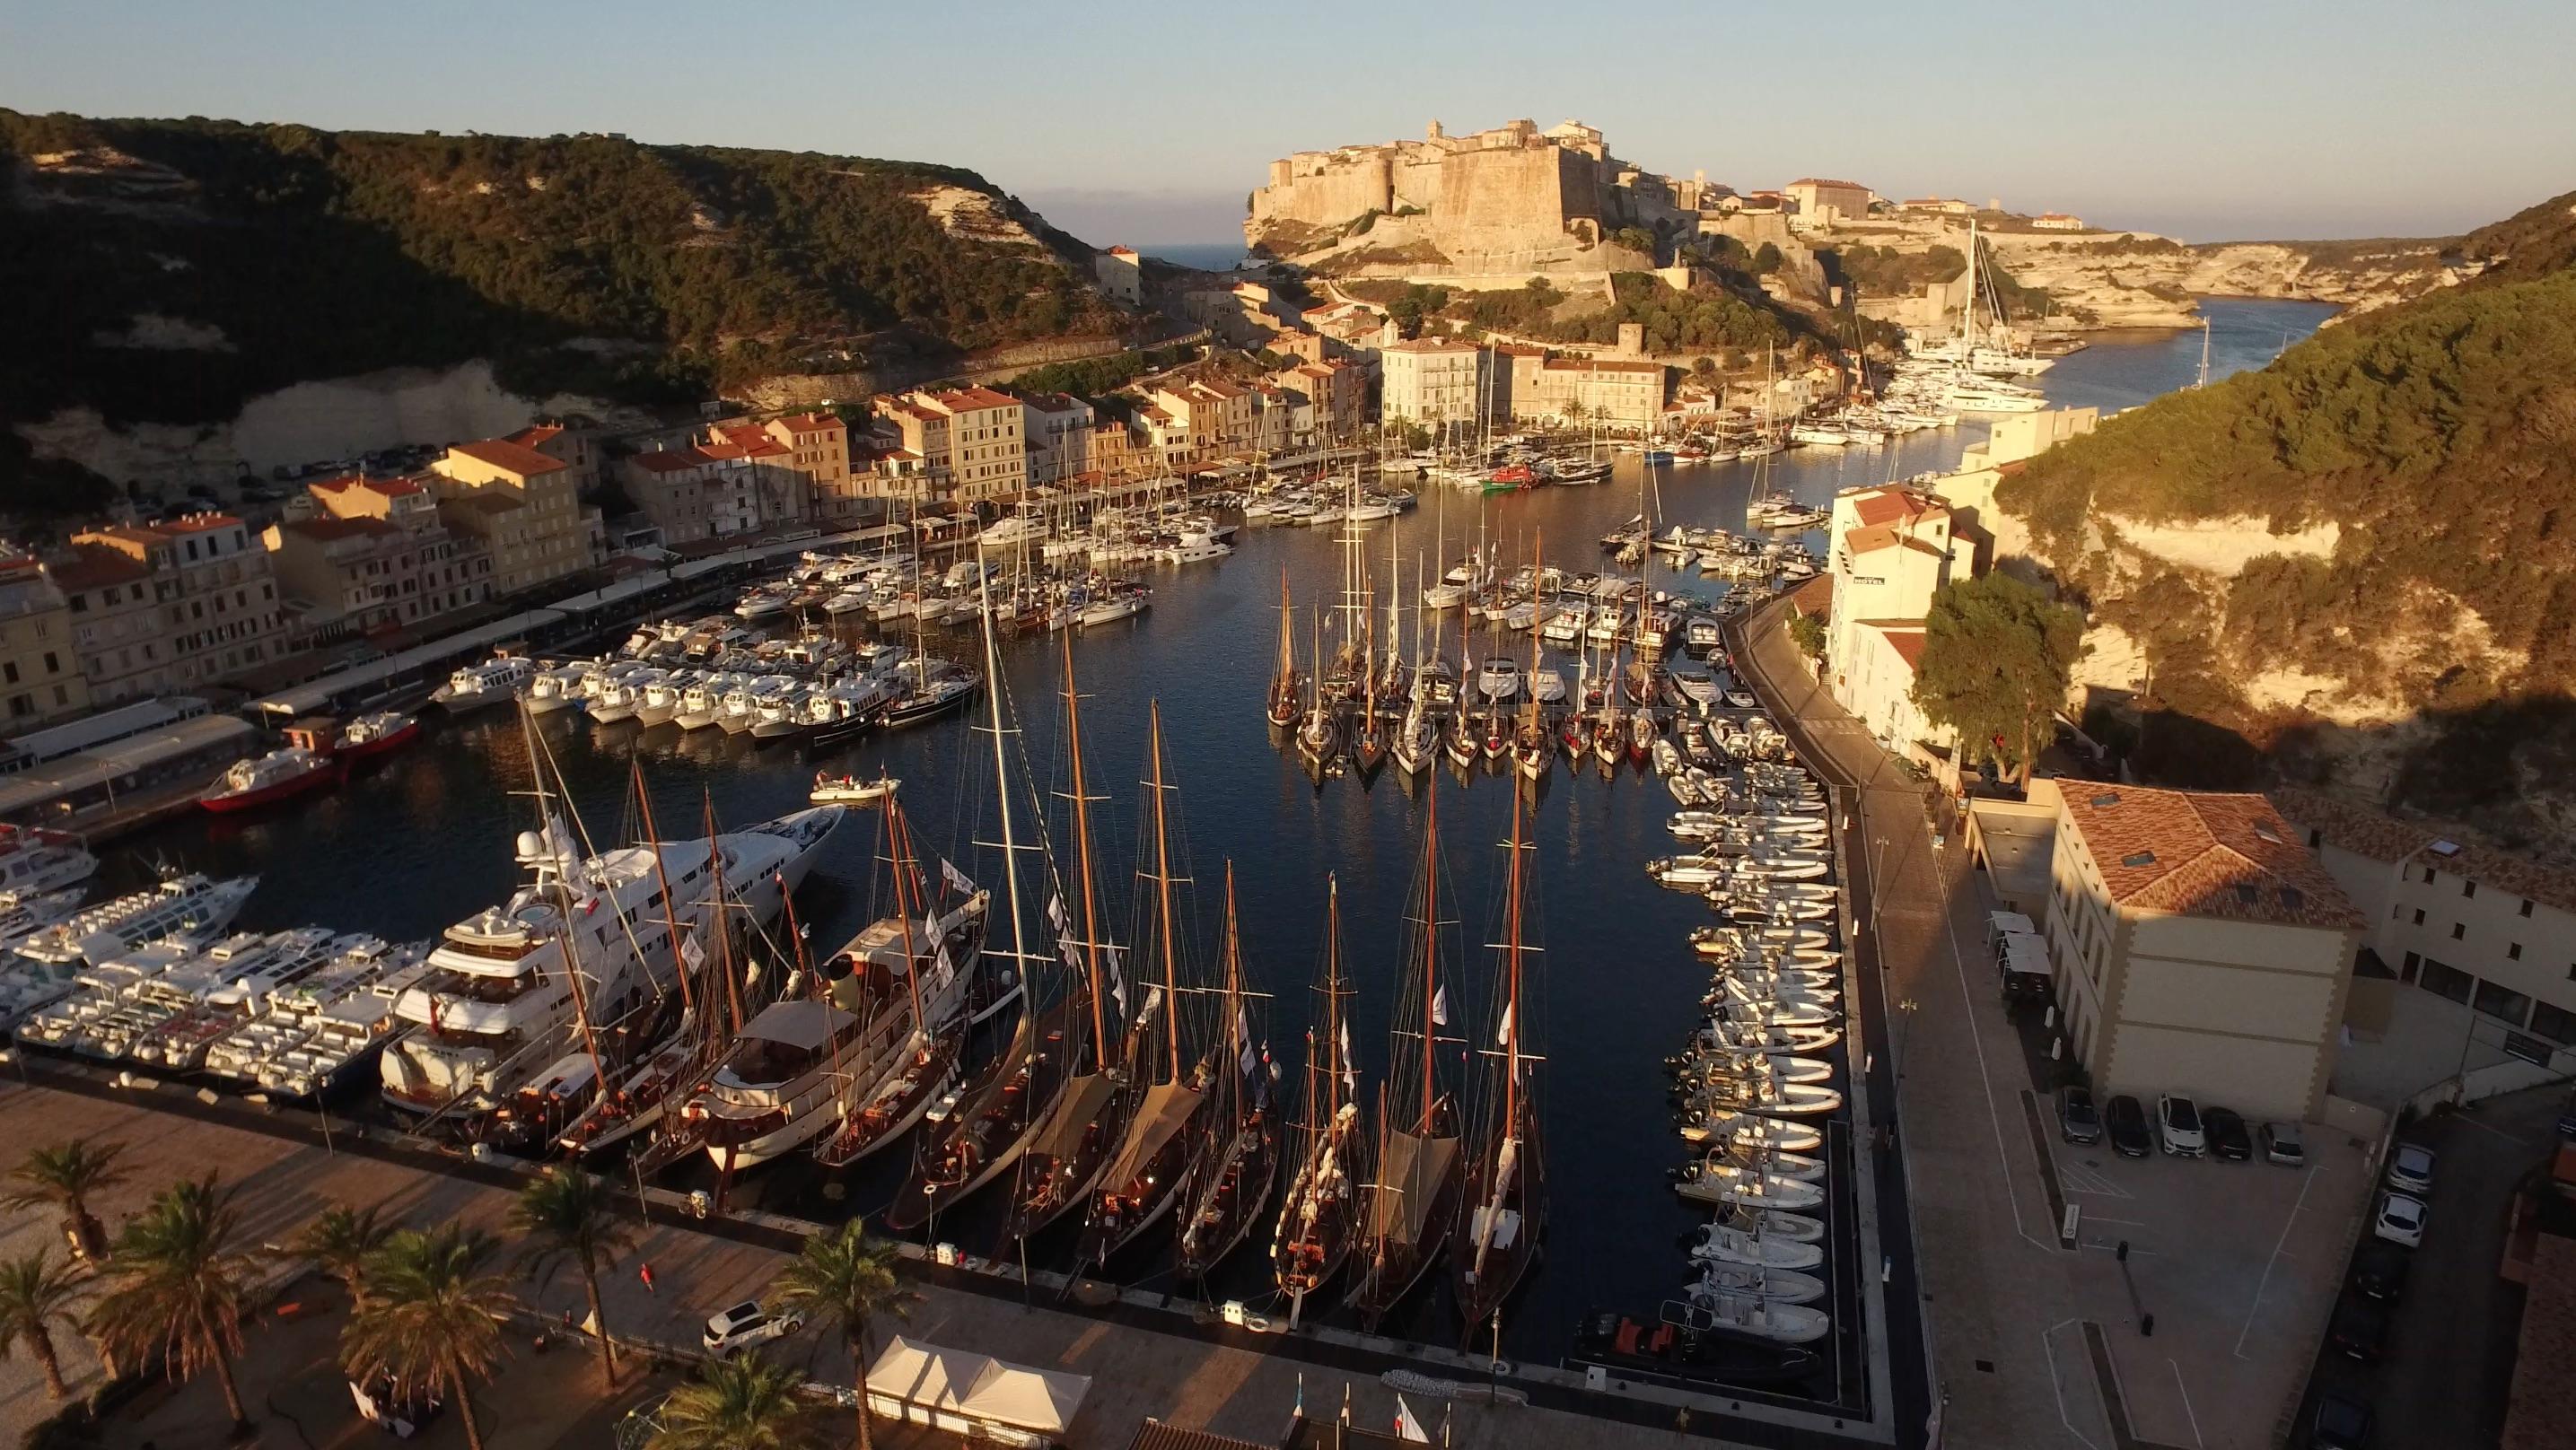 Port de Bonifacio Corsica Classic 2016 photo Emmanuel Kirch by drone pilot Nicolas di Stefano DR